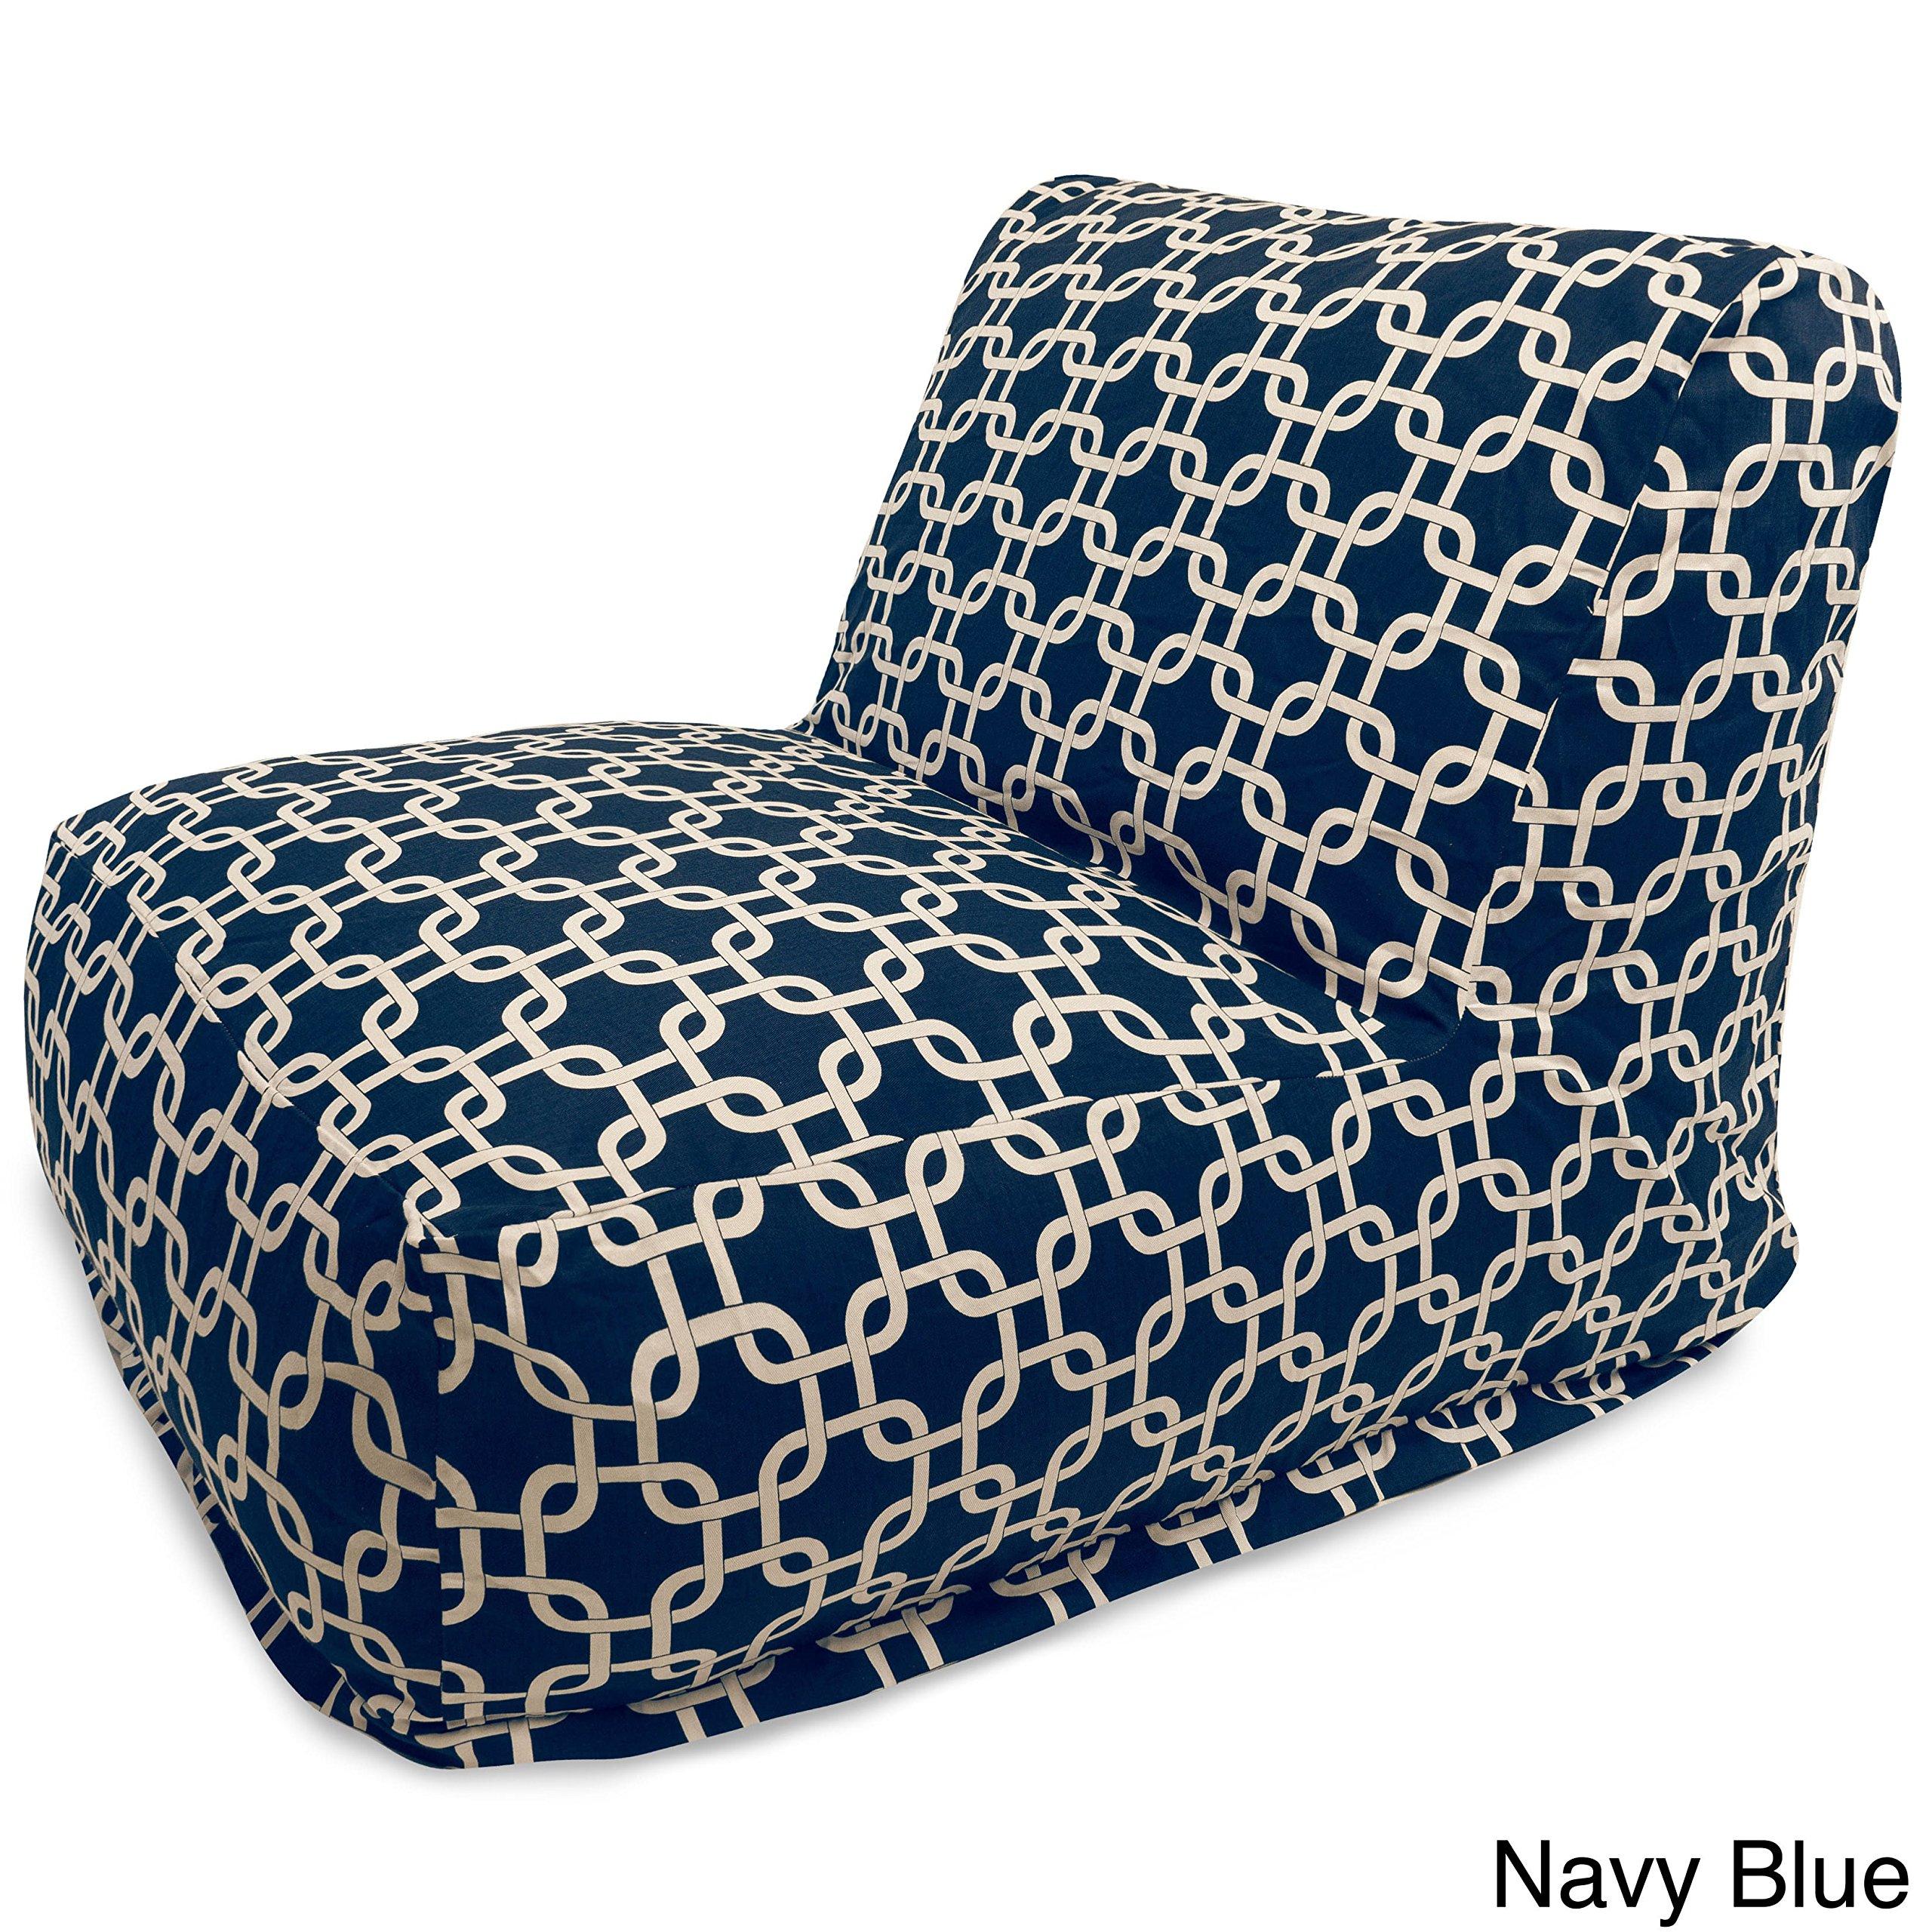 Majestic Home Goods Links Bean Bag Chair Lounger, Navy Blue